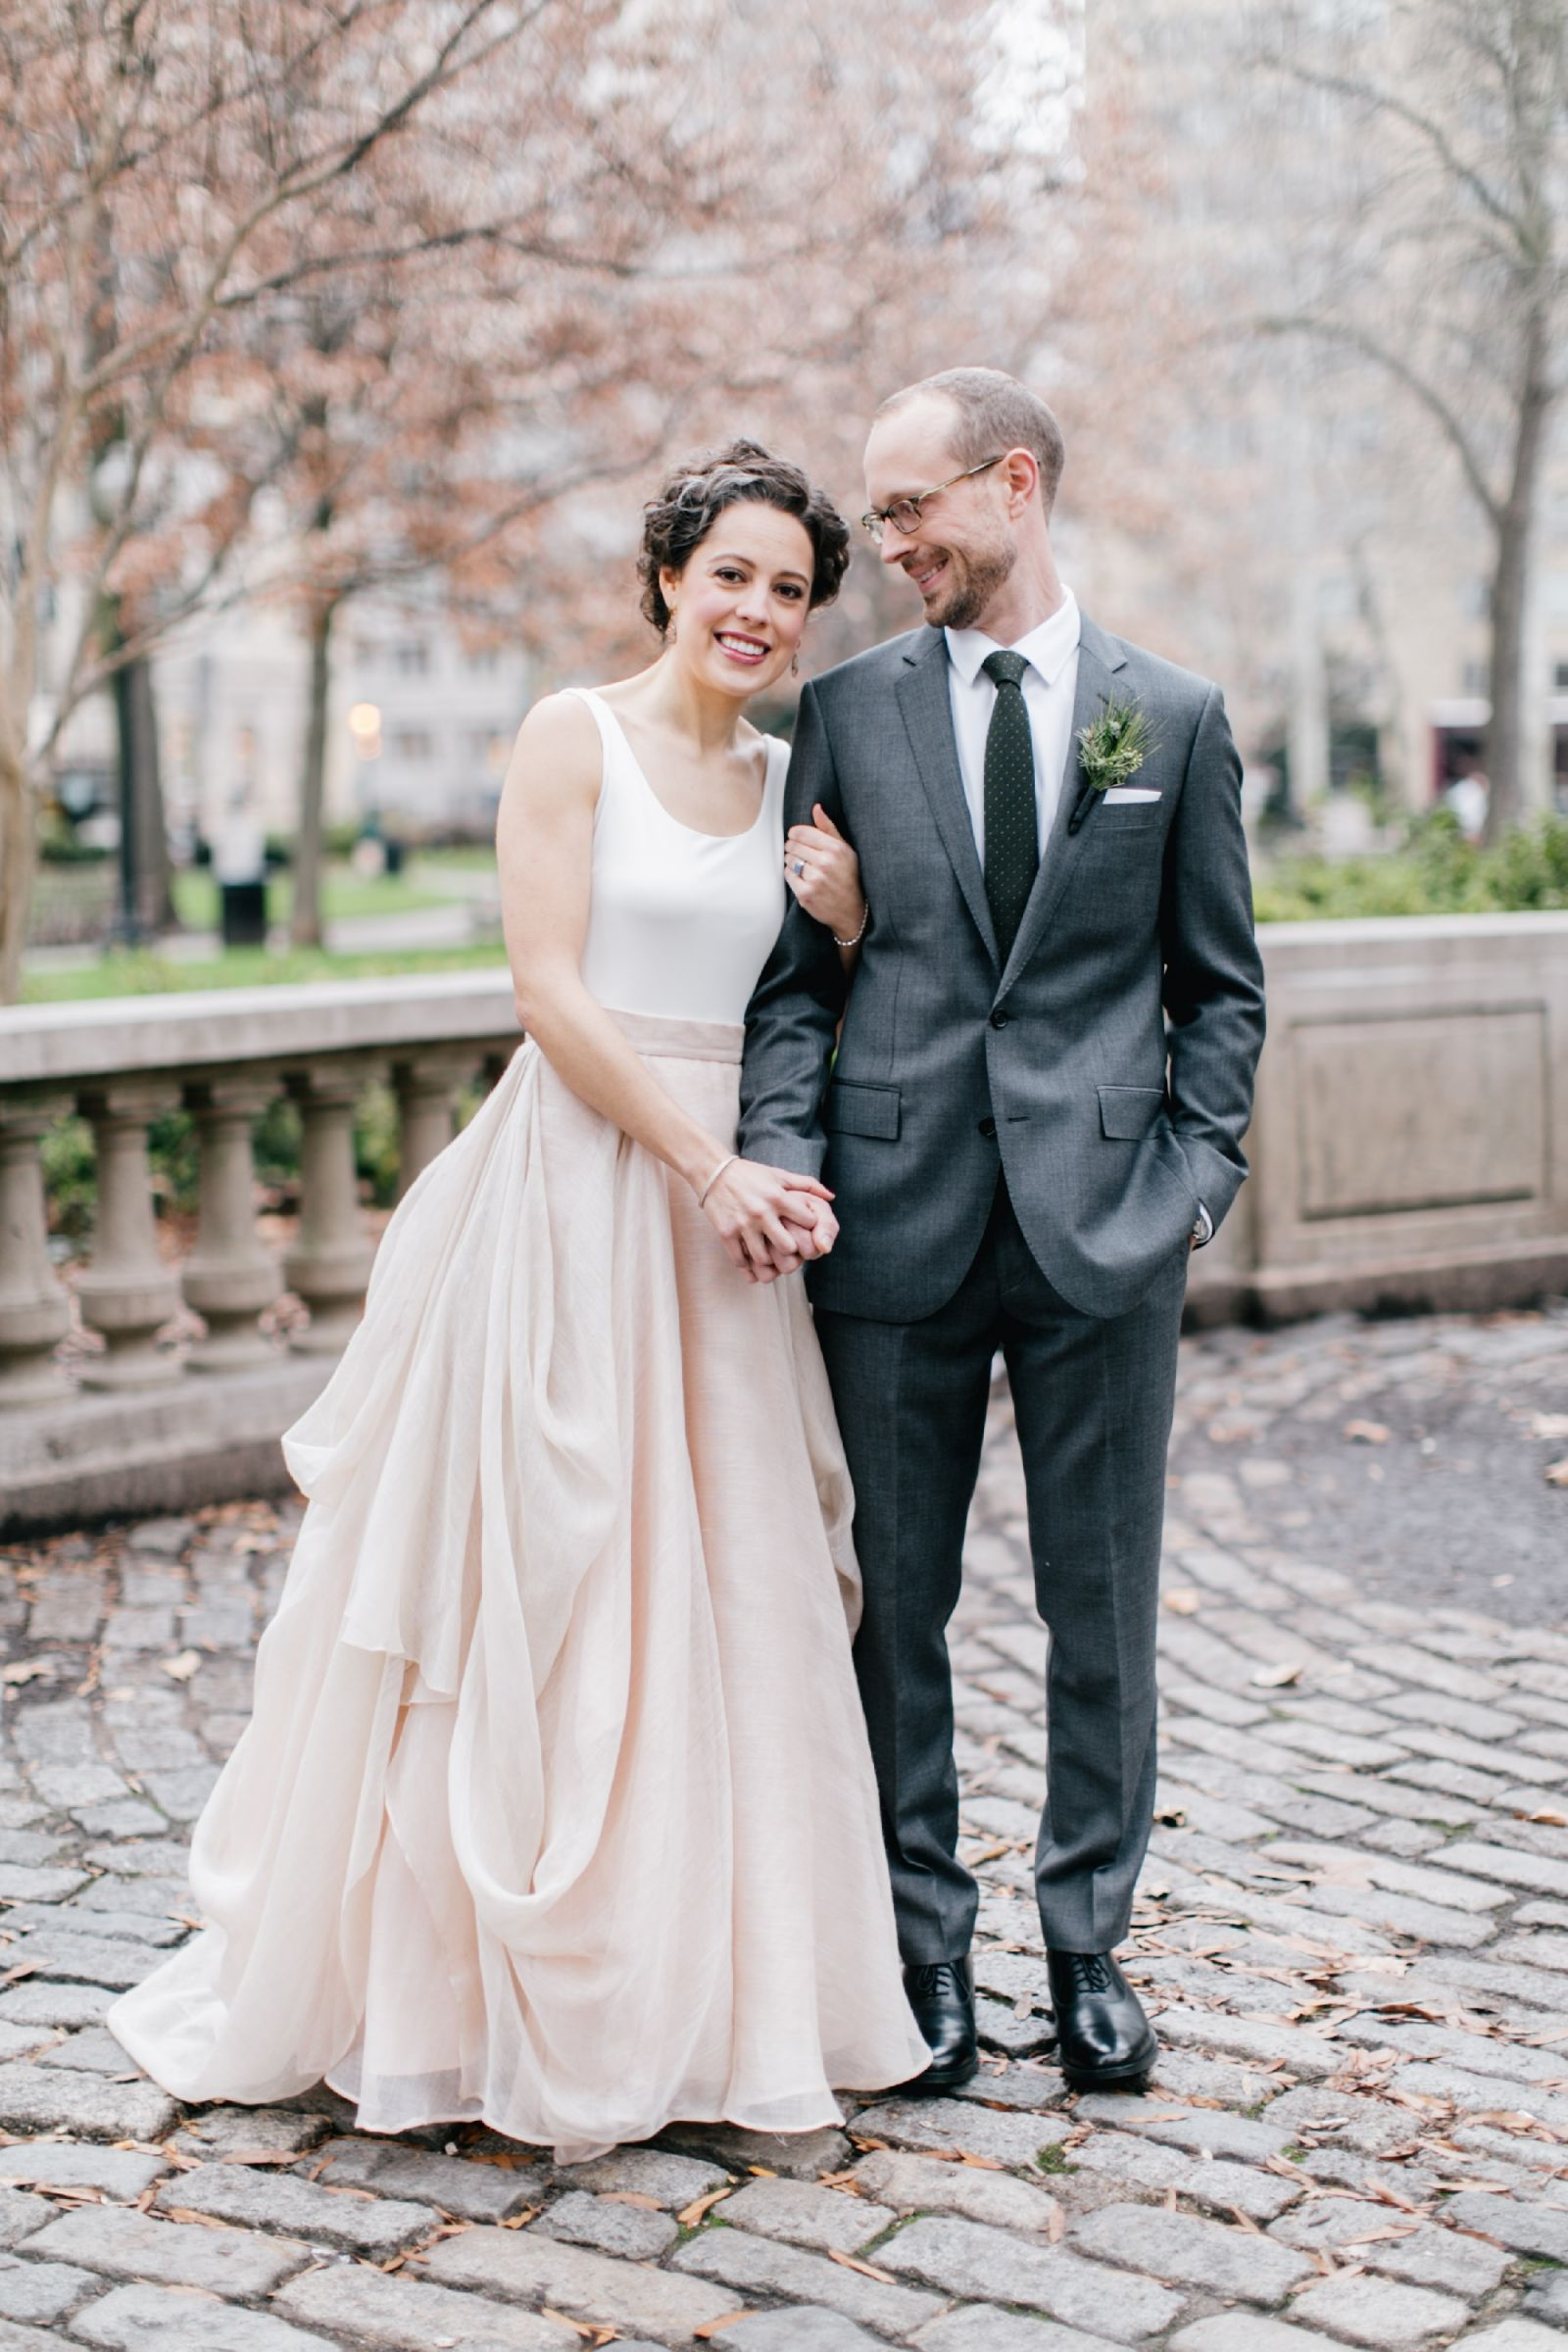 Carol hannah size 4 wedding dress wedding dress weddings and carol hannah second hand wedding dress on sale 18 off ombrellifo Image collections